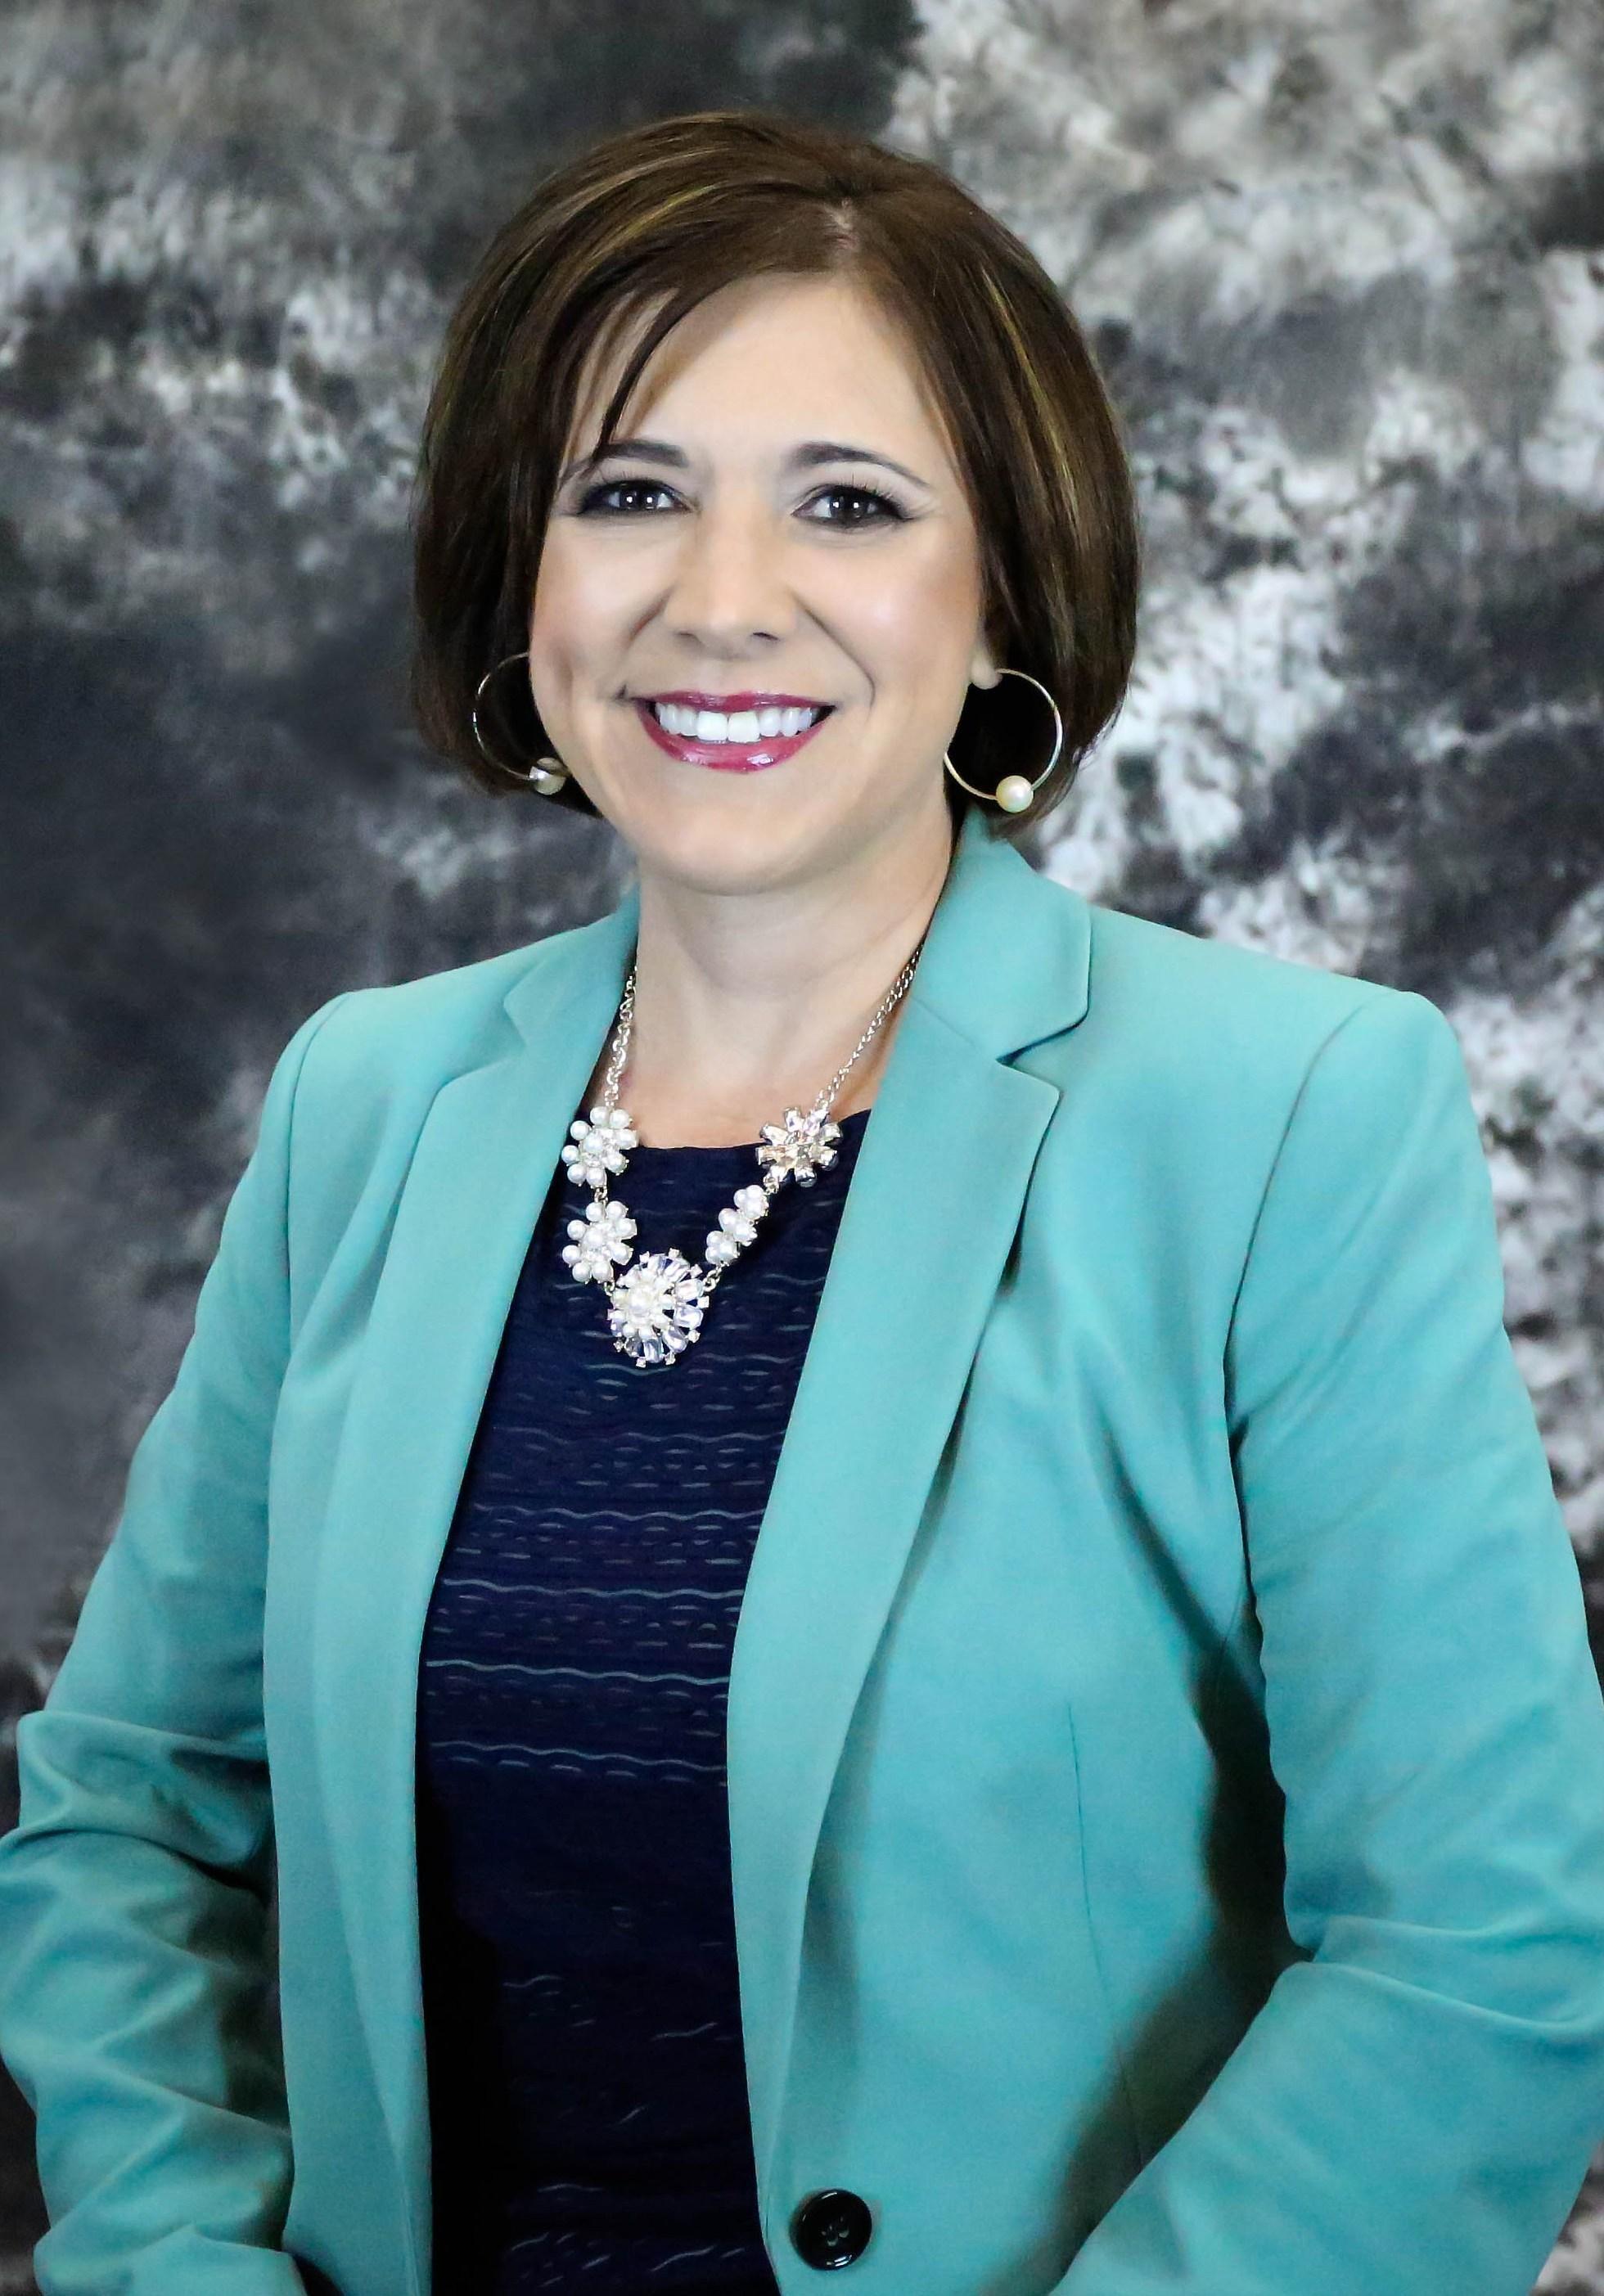 Diane Perez, Superintendent